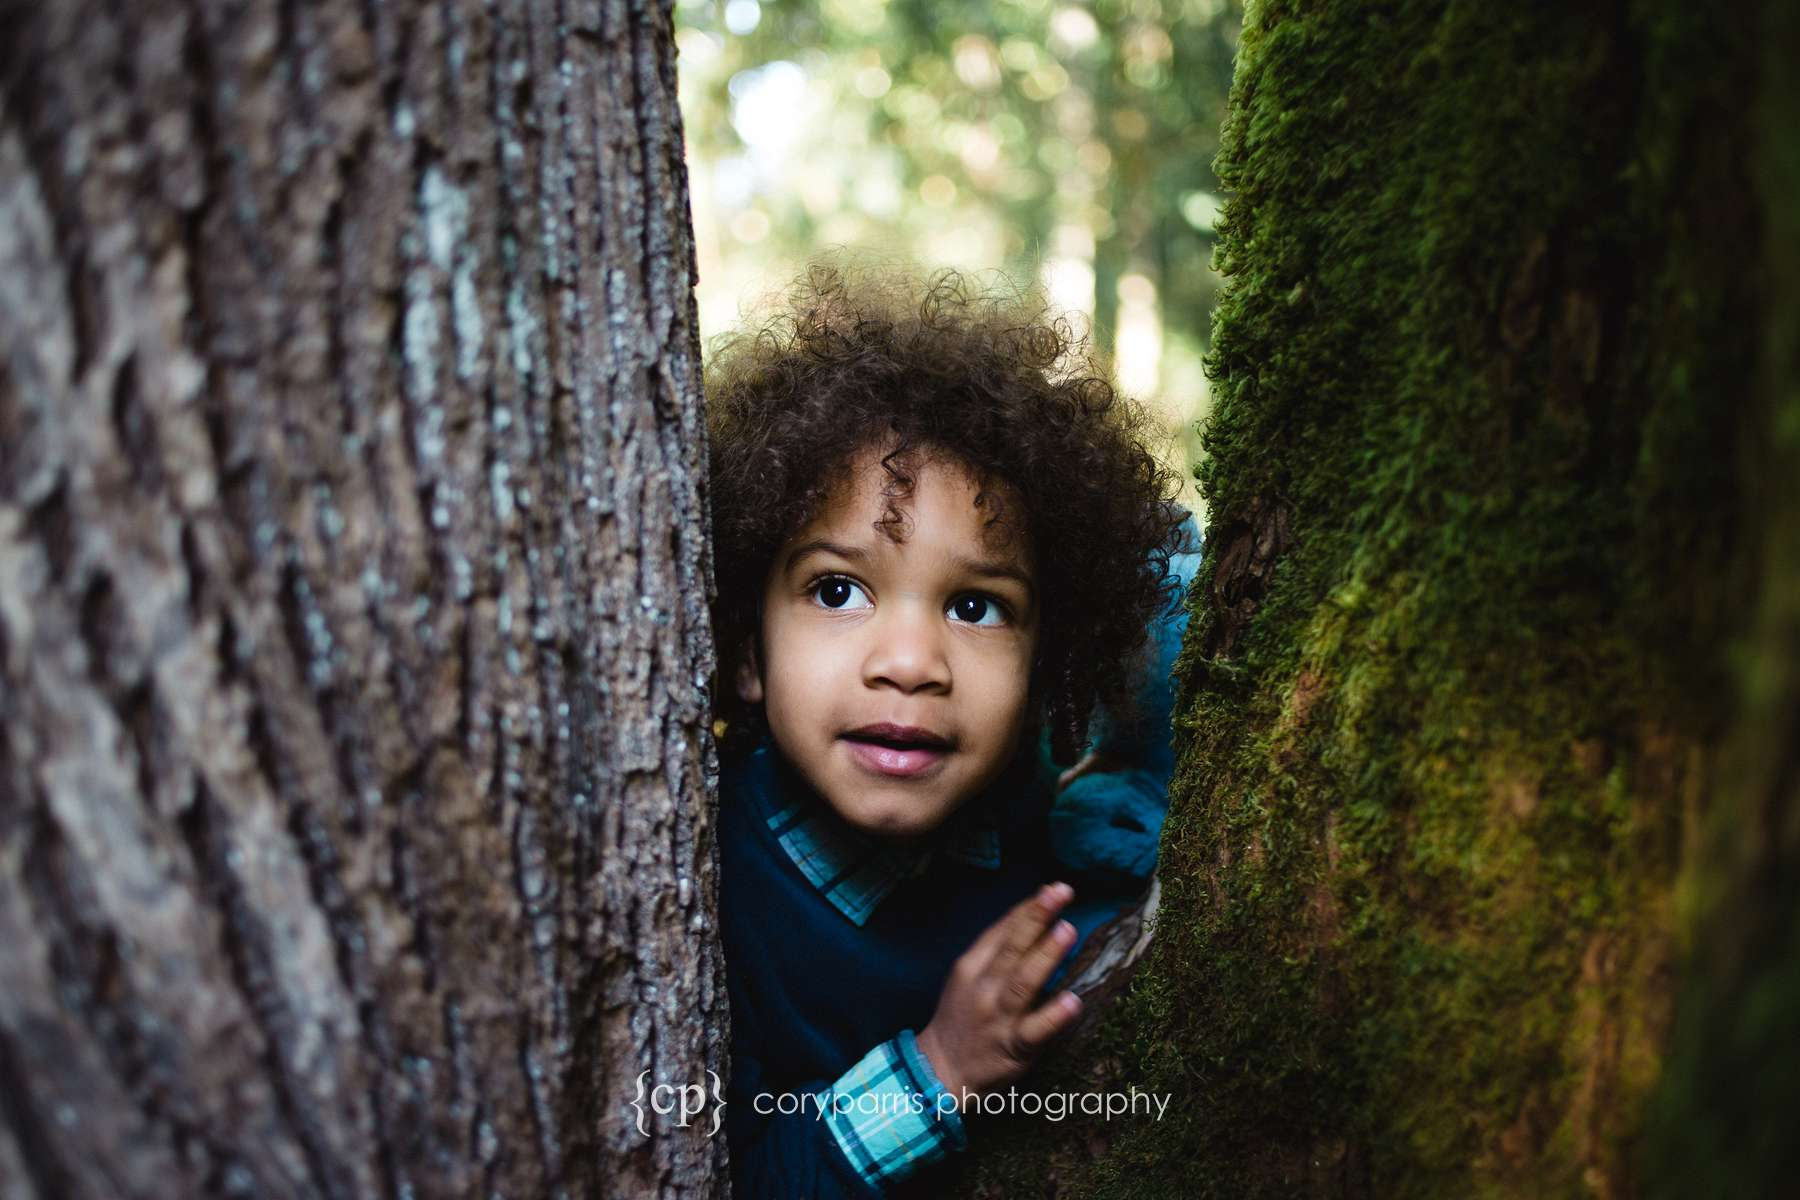 Portrait photography in Bellevue Botanical Gardens